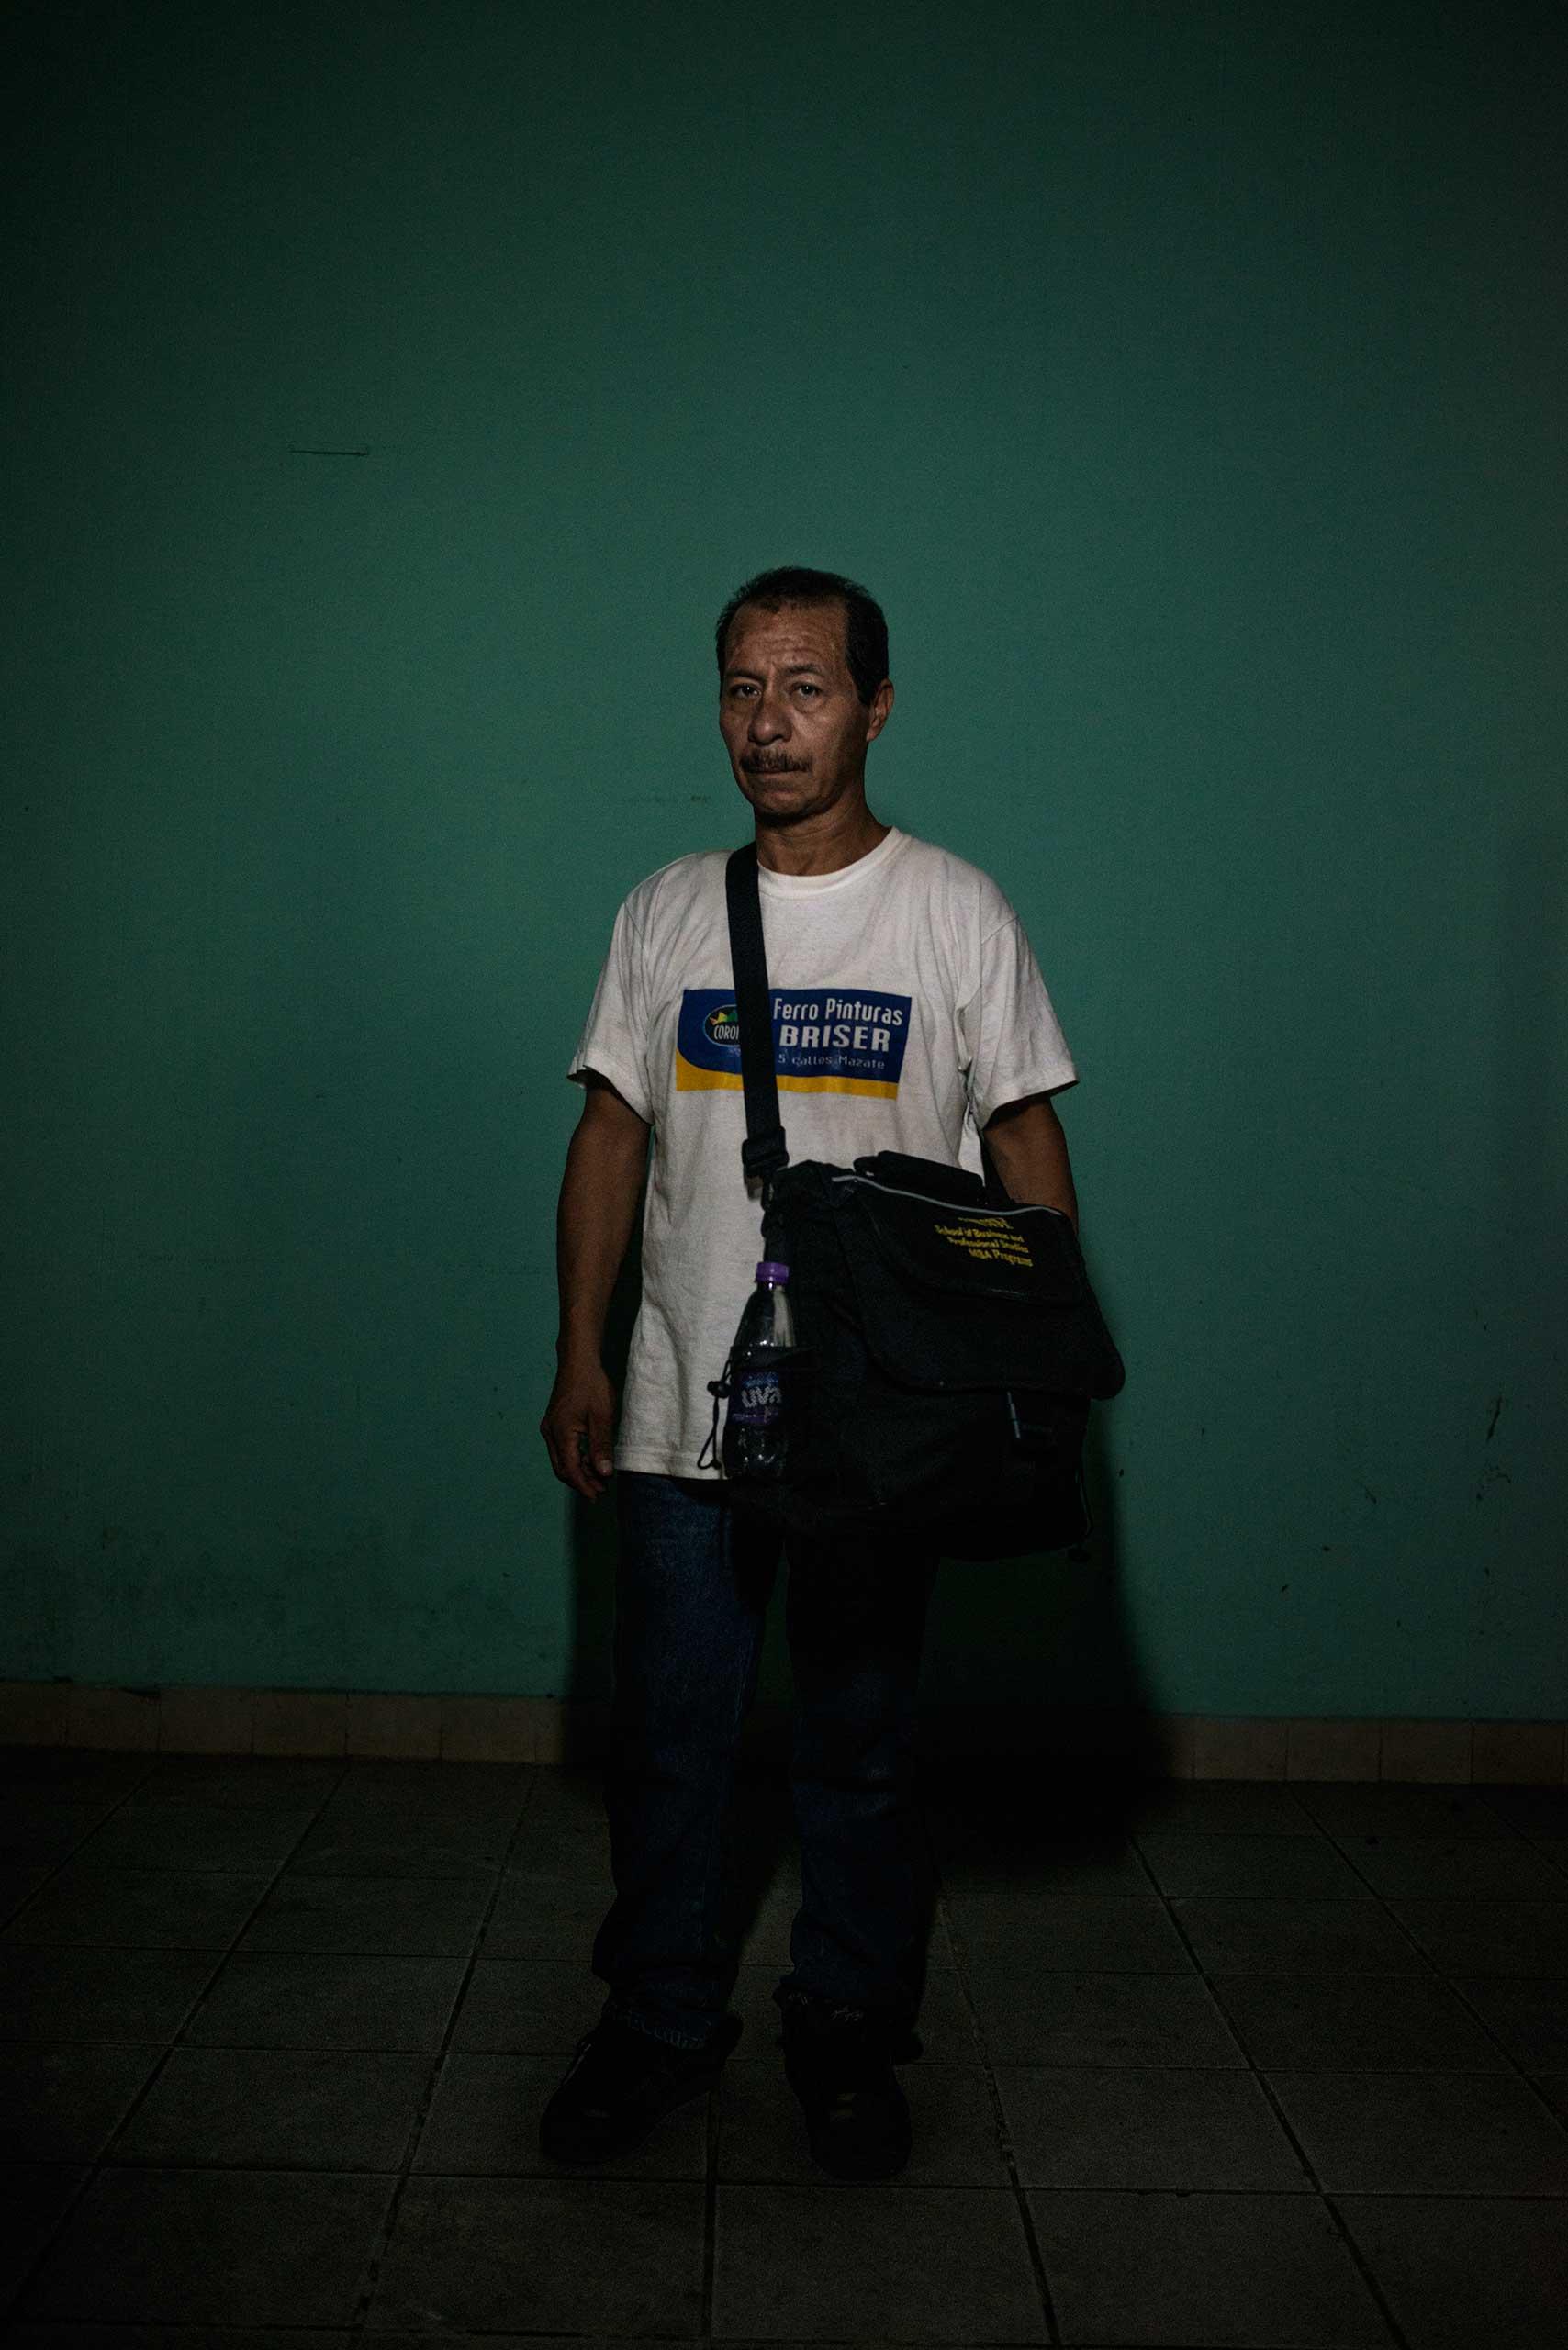 Luis Alfredo Portales, 43, from Guatemala.